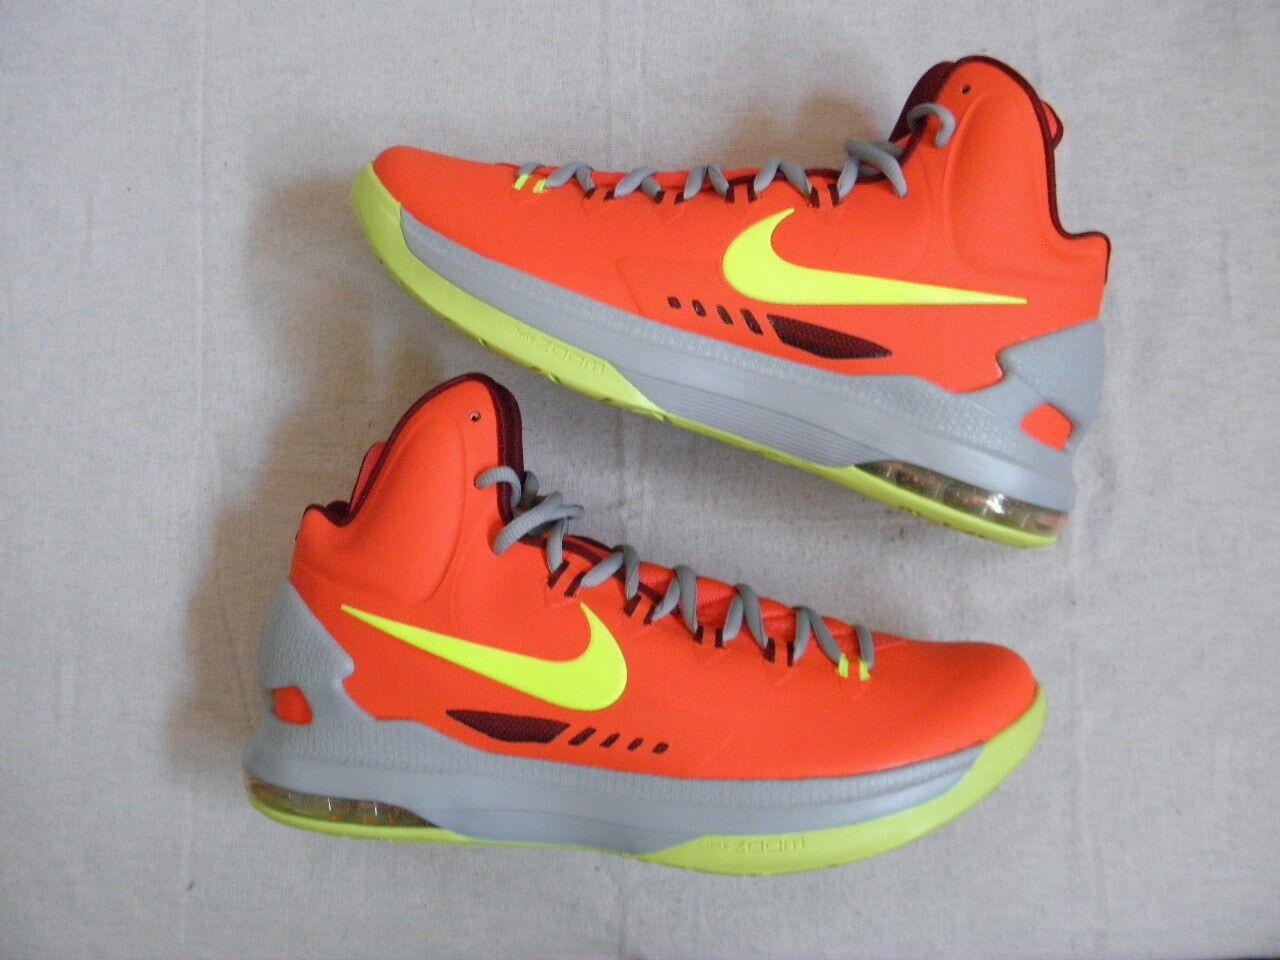 74fbbc6f1597 Nike Air Zoom KD KD5 KD5 KD5 5 V sz 11 Durant DMV DC Maryland Virginia